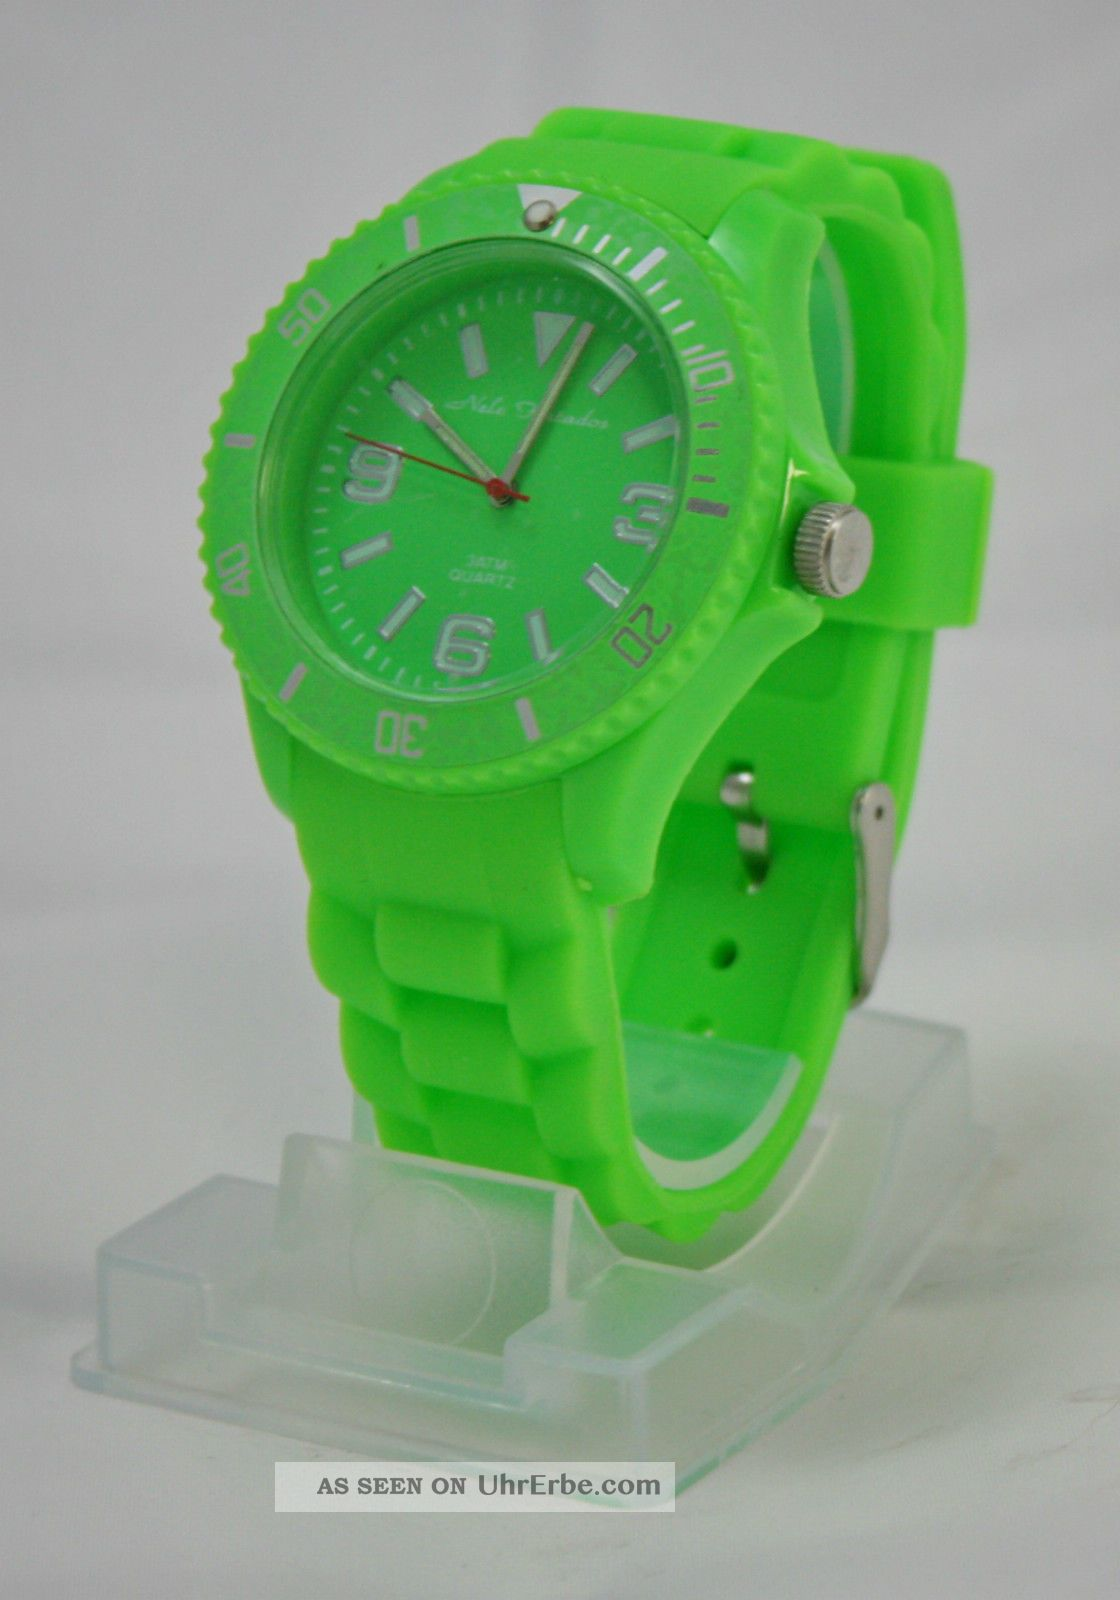 Herren Armbanduhr Fortados Uhr Colorful Silikon World Damen 37mm Nele 5RLq3S4Ajc